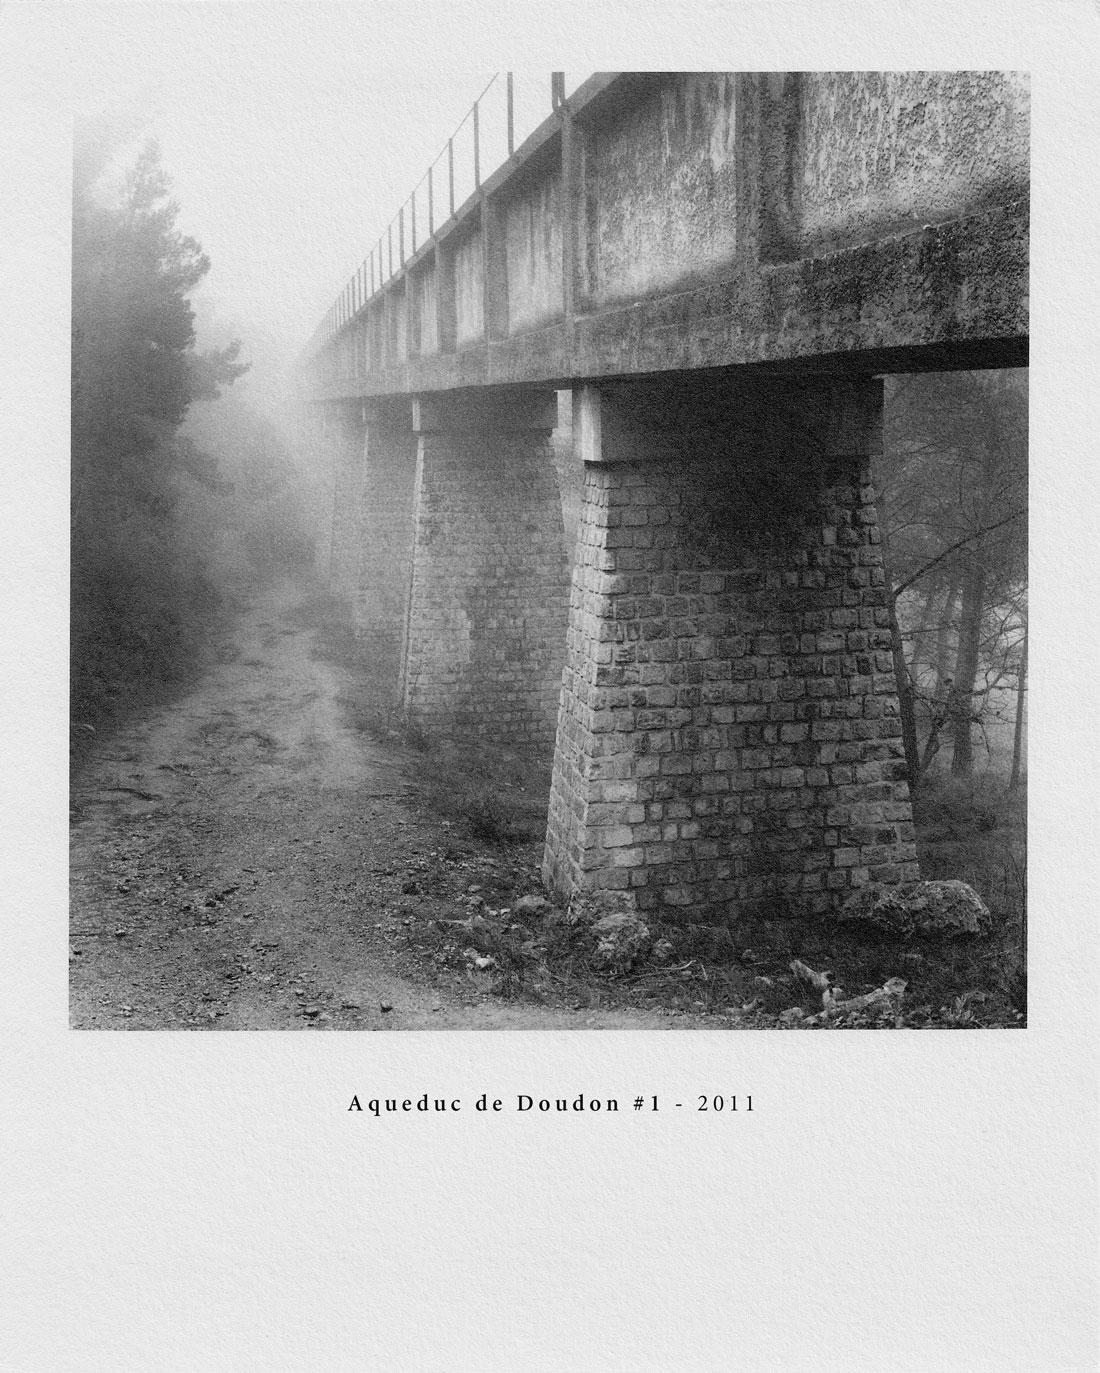 03-Aqueduc-Doudon-1